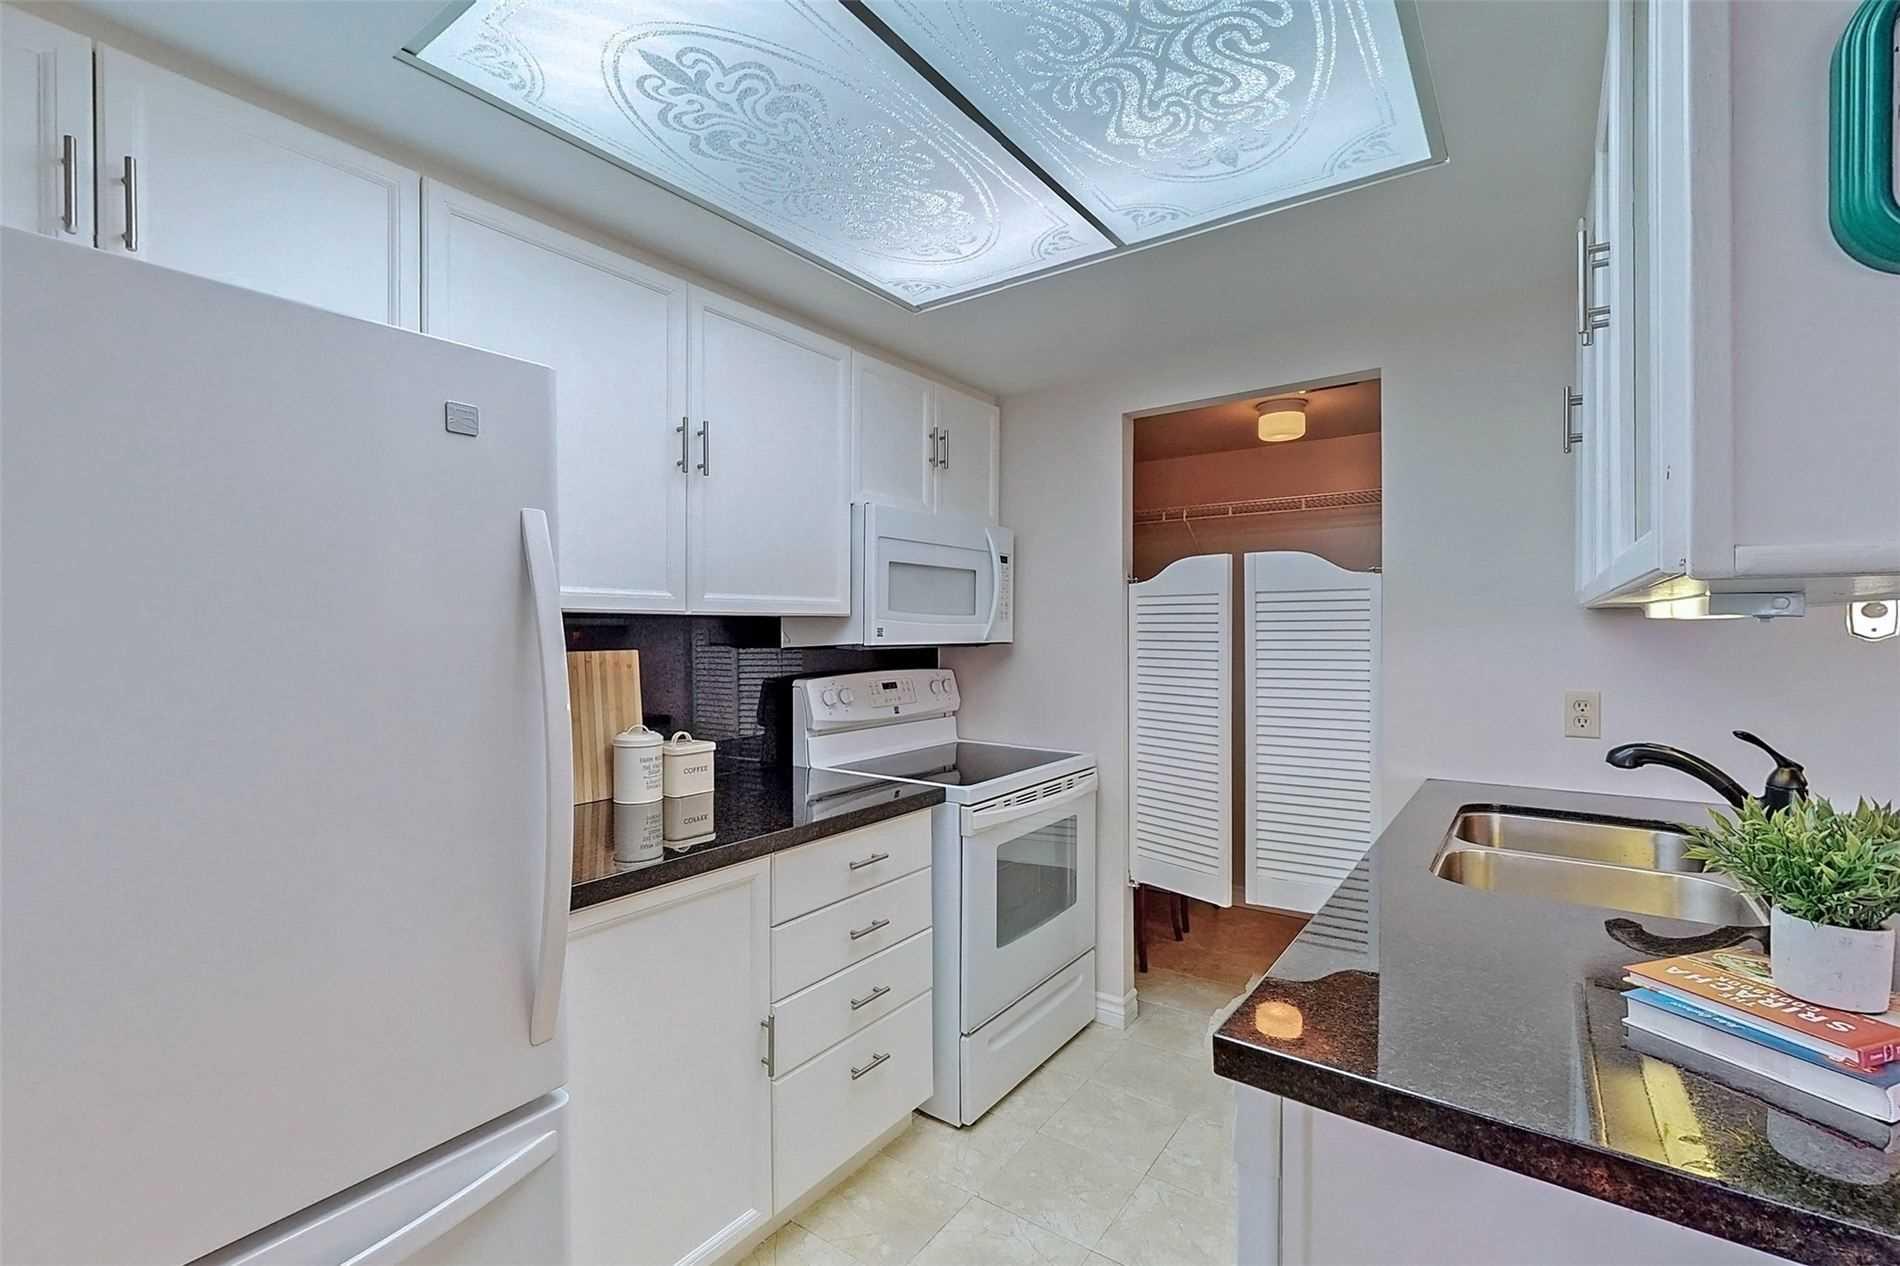 Condo Apt For Sale In Markham , 2 Bedrooms Bedrooms, ,1 BathroomBathrooms,Condo Apt,For Sale,903,Raymerville